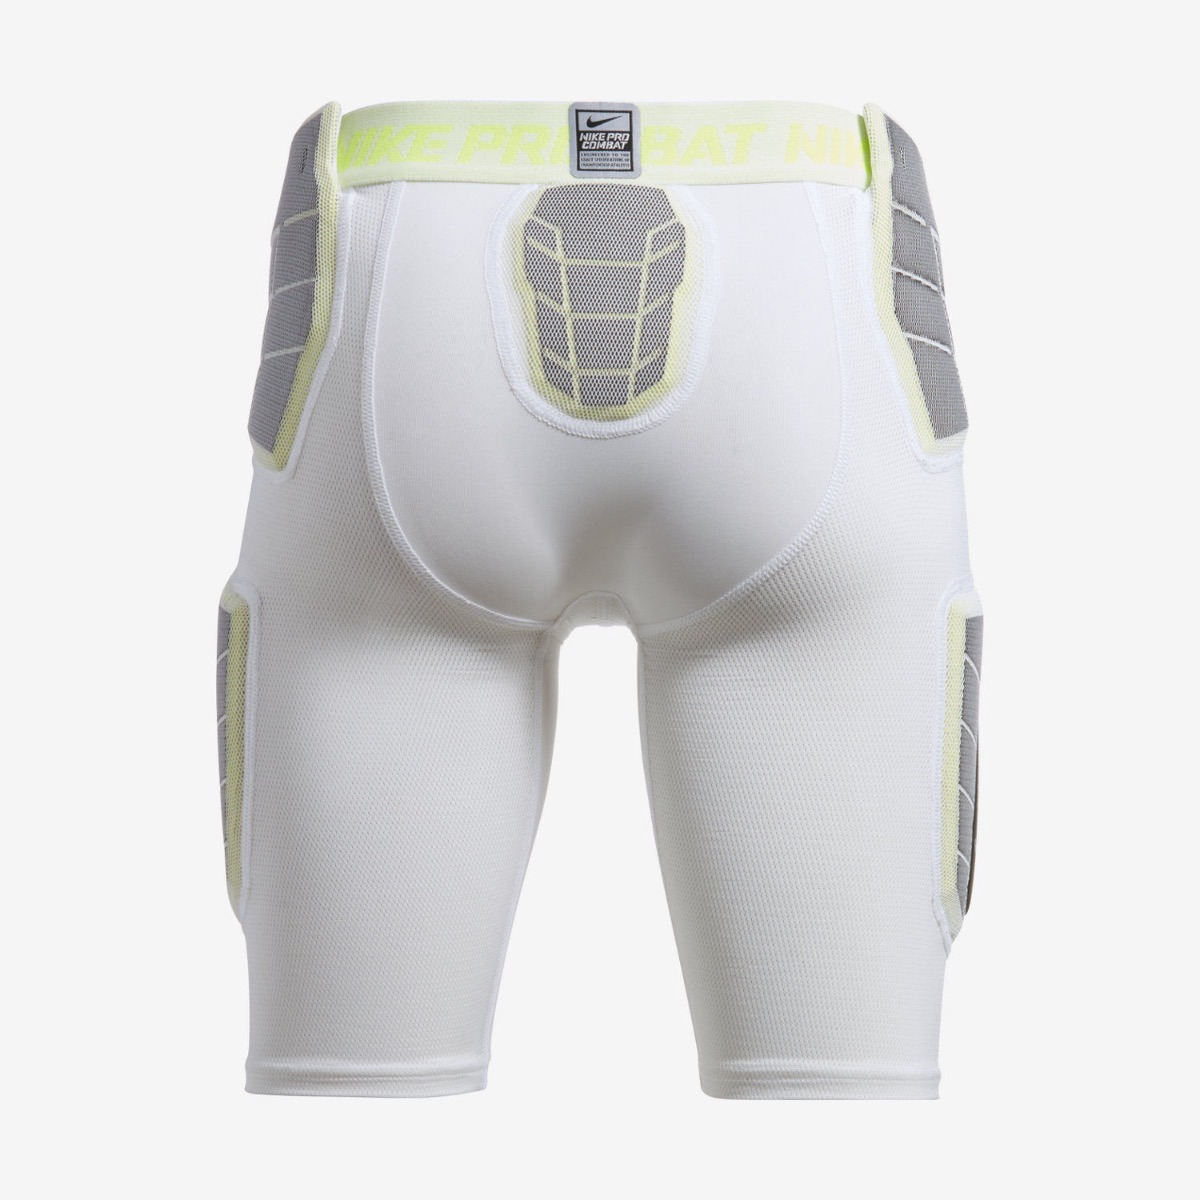 9fa46f5298 bermuda nike pro hyperstrong futebol americano nfl protetor. Carregando  zoom.